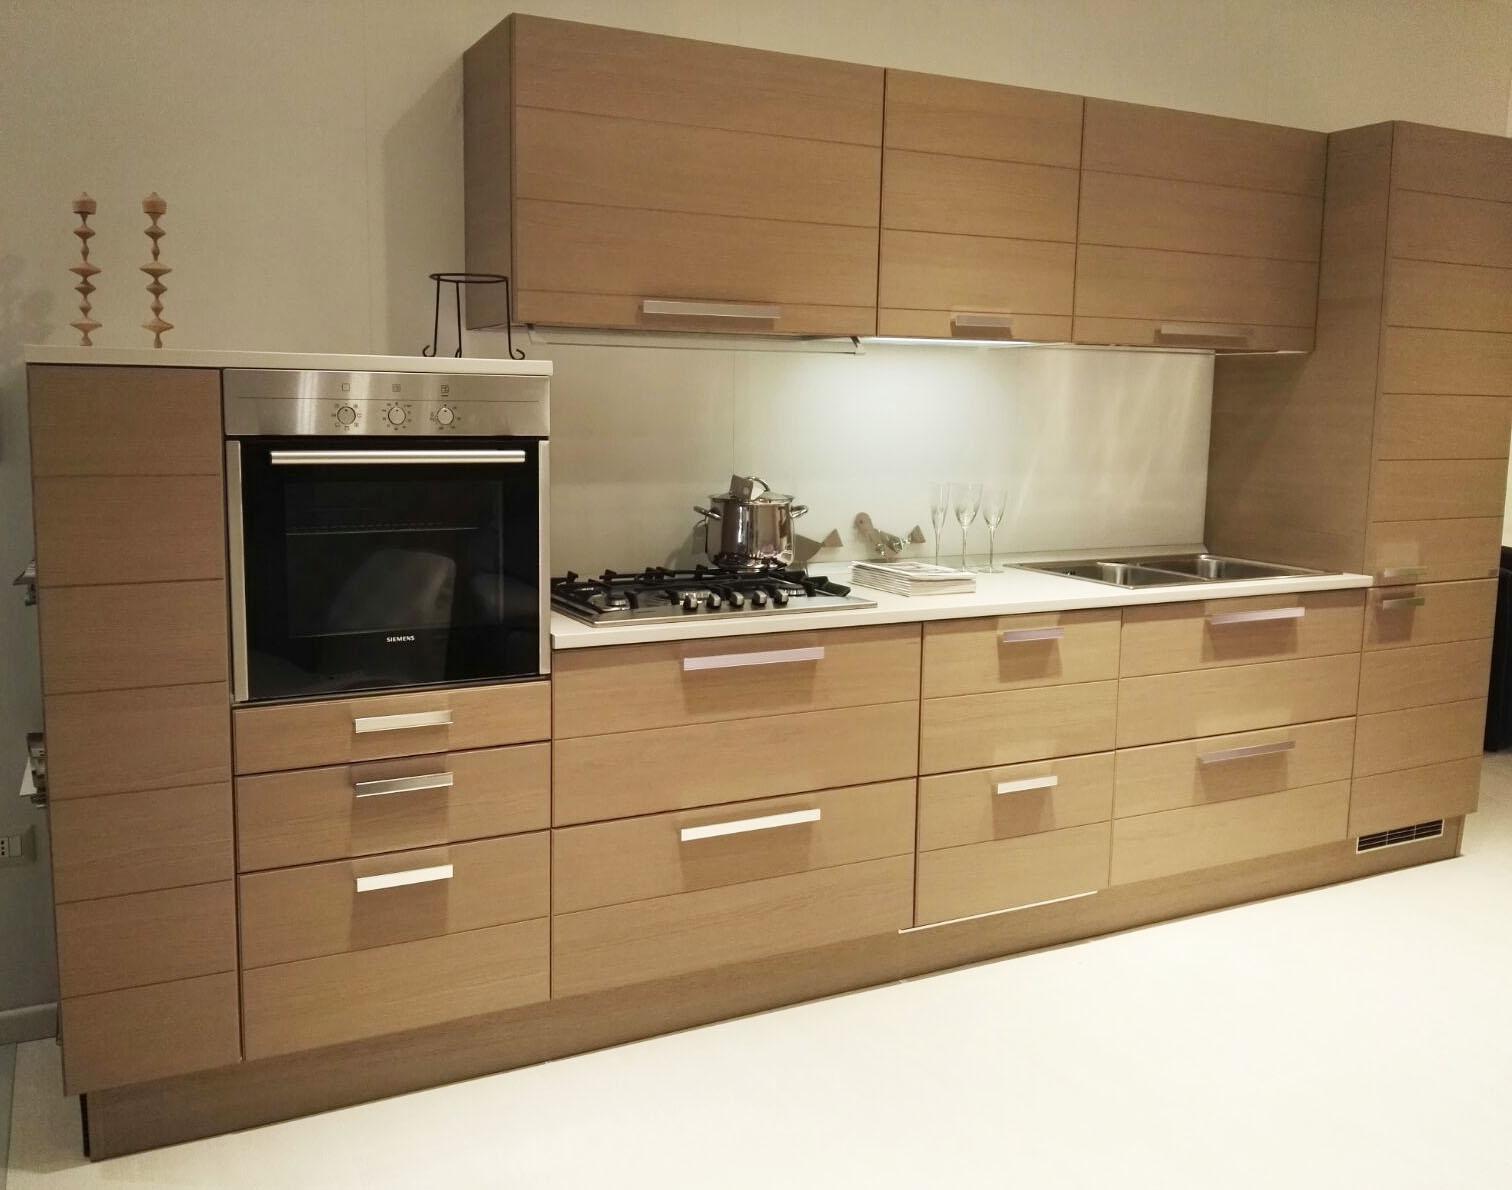 Cucina scavolini open moderna legno cucine a prezzi scontati for La cucina moderna wikipedia